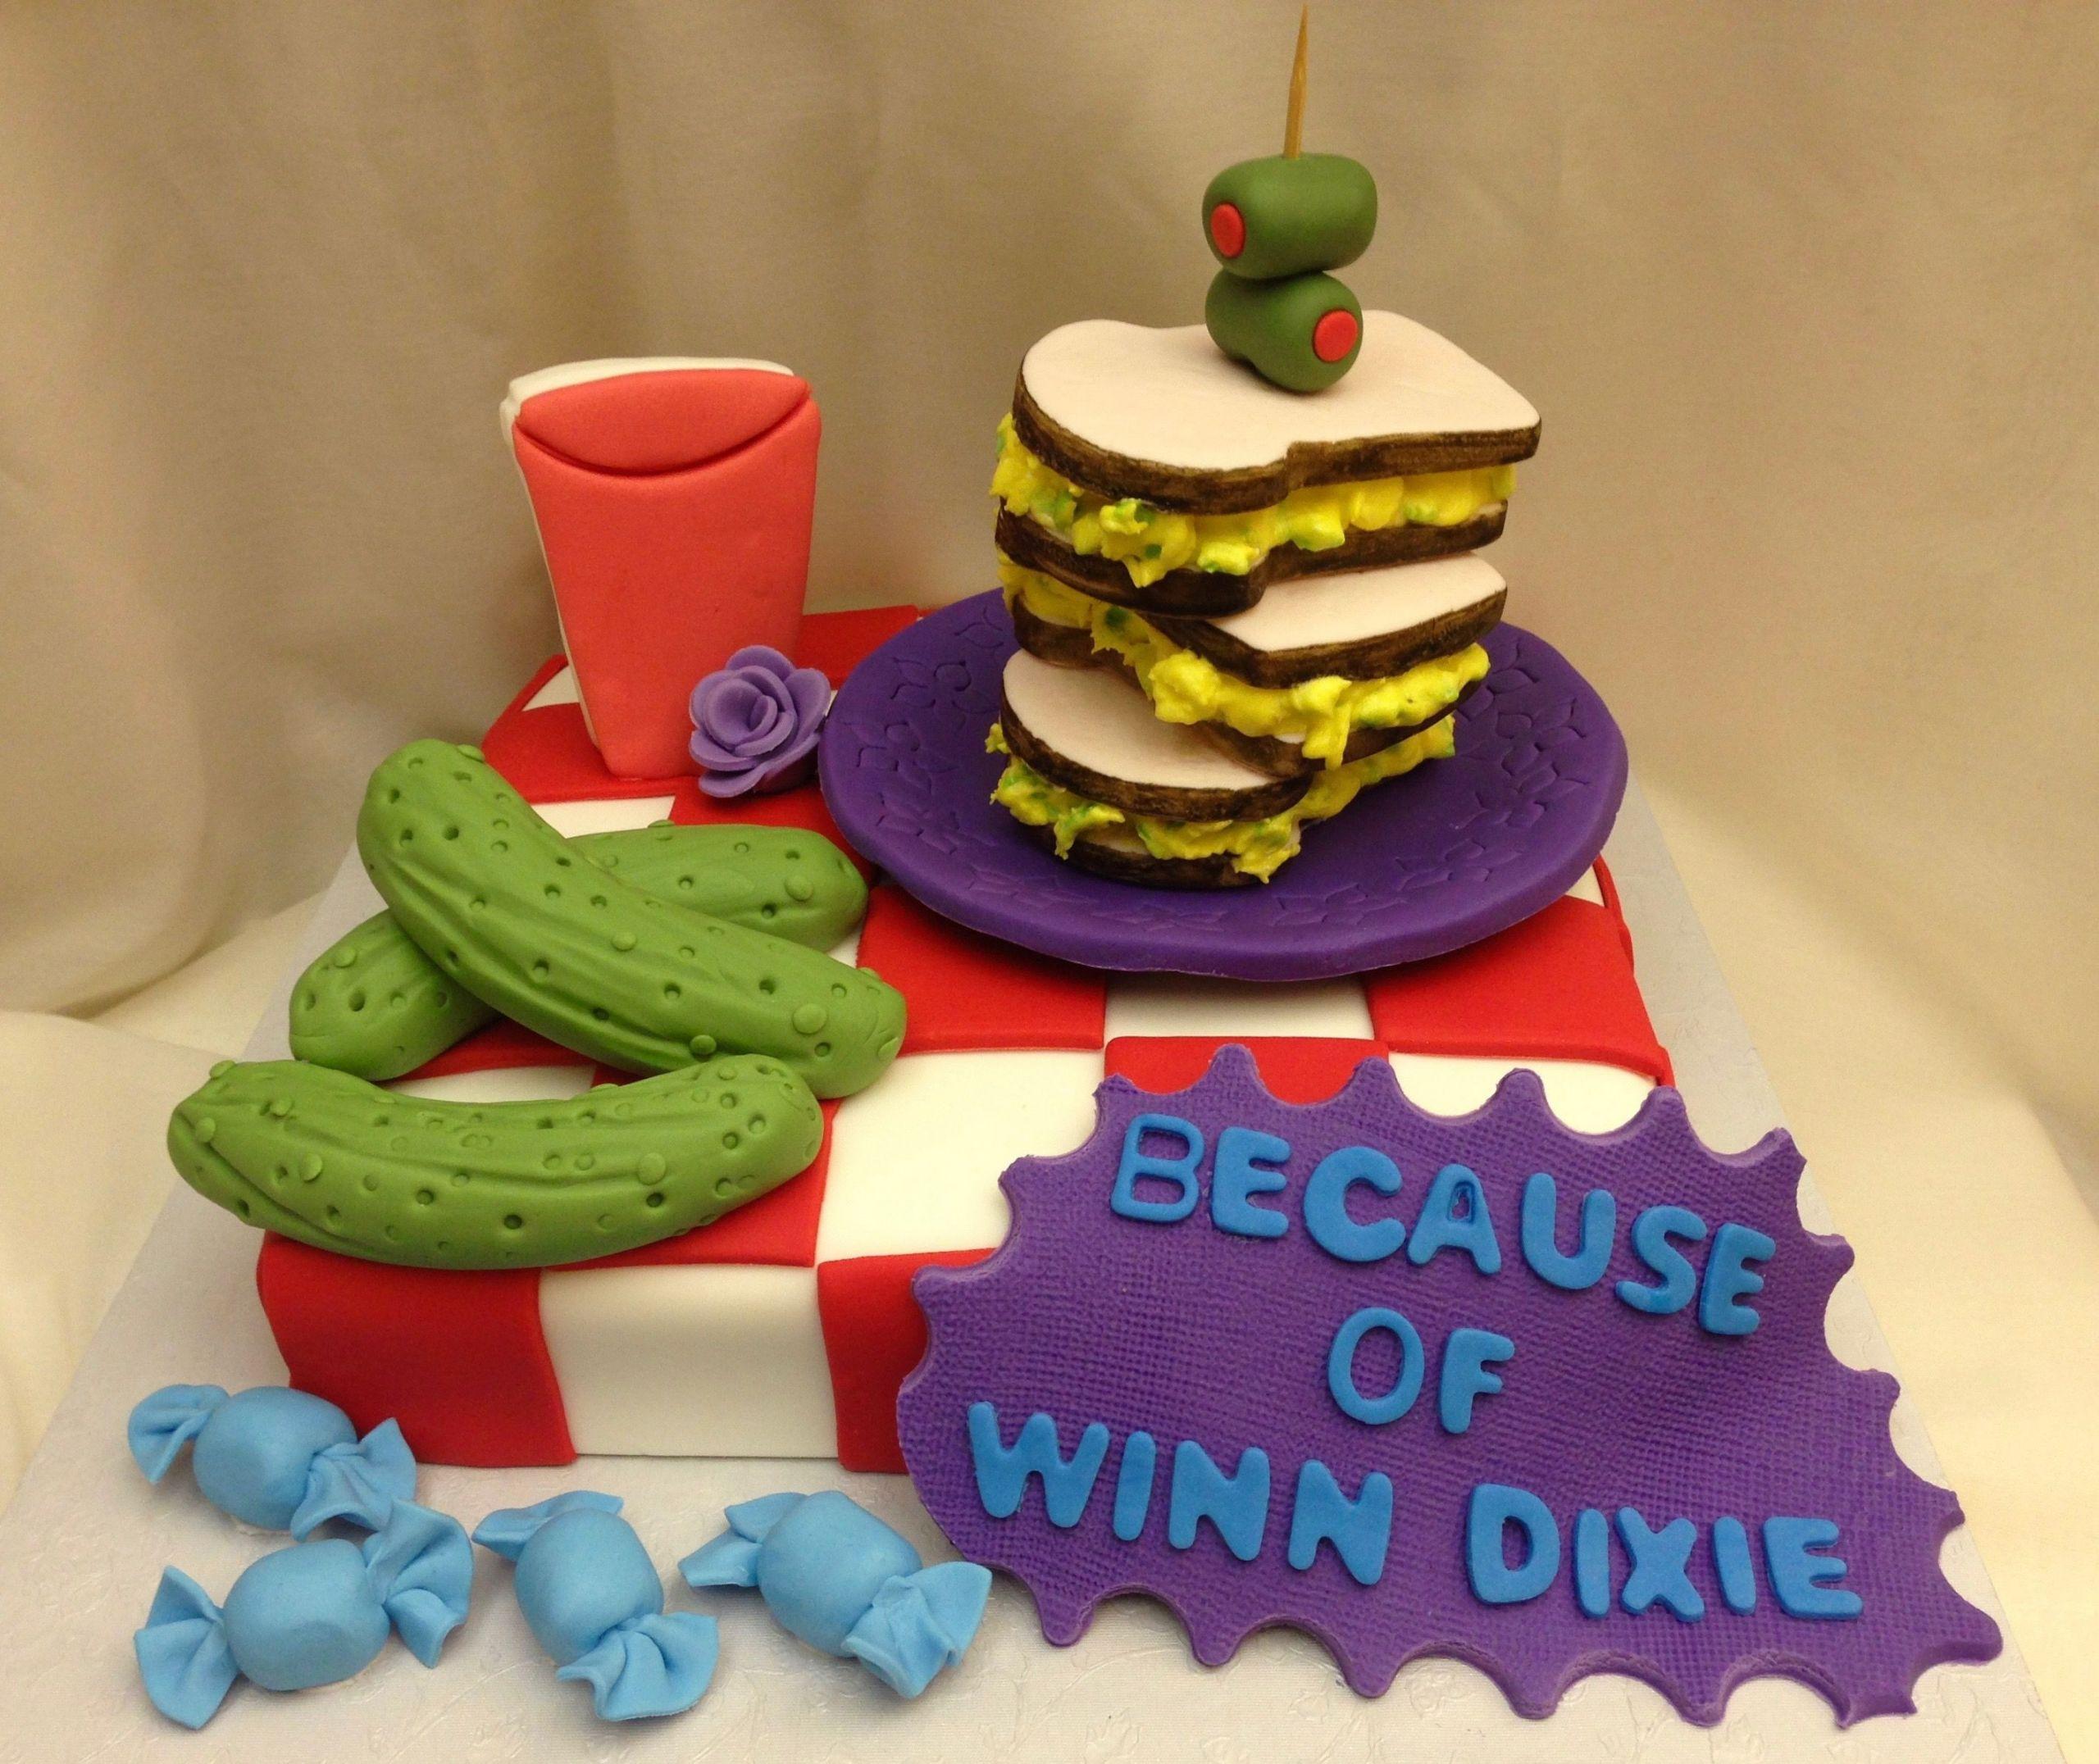 Winn Dixie Birthday Cakes  Because of Winn Dixie cake